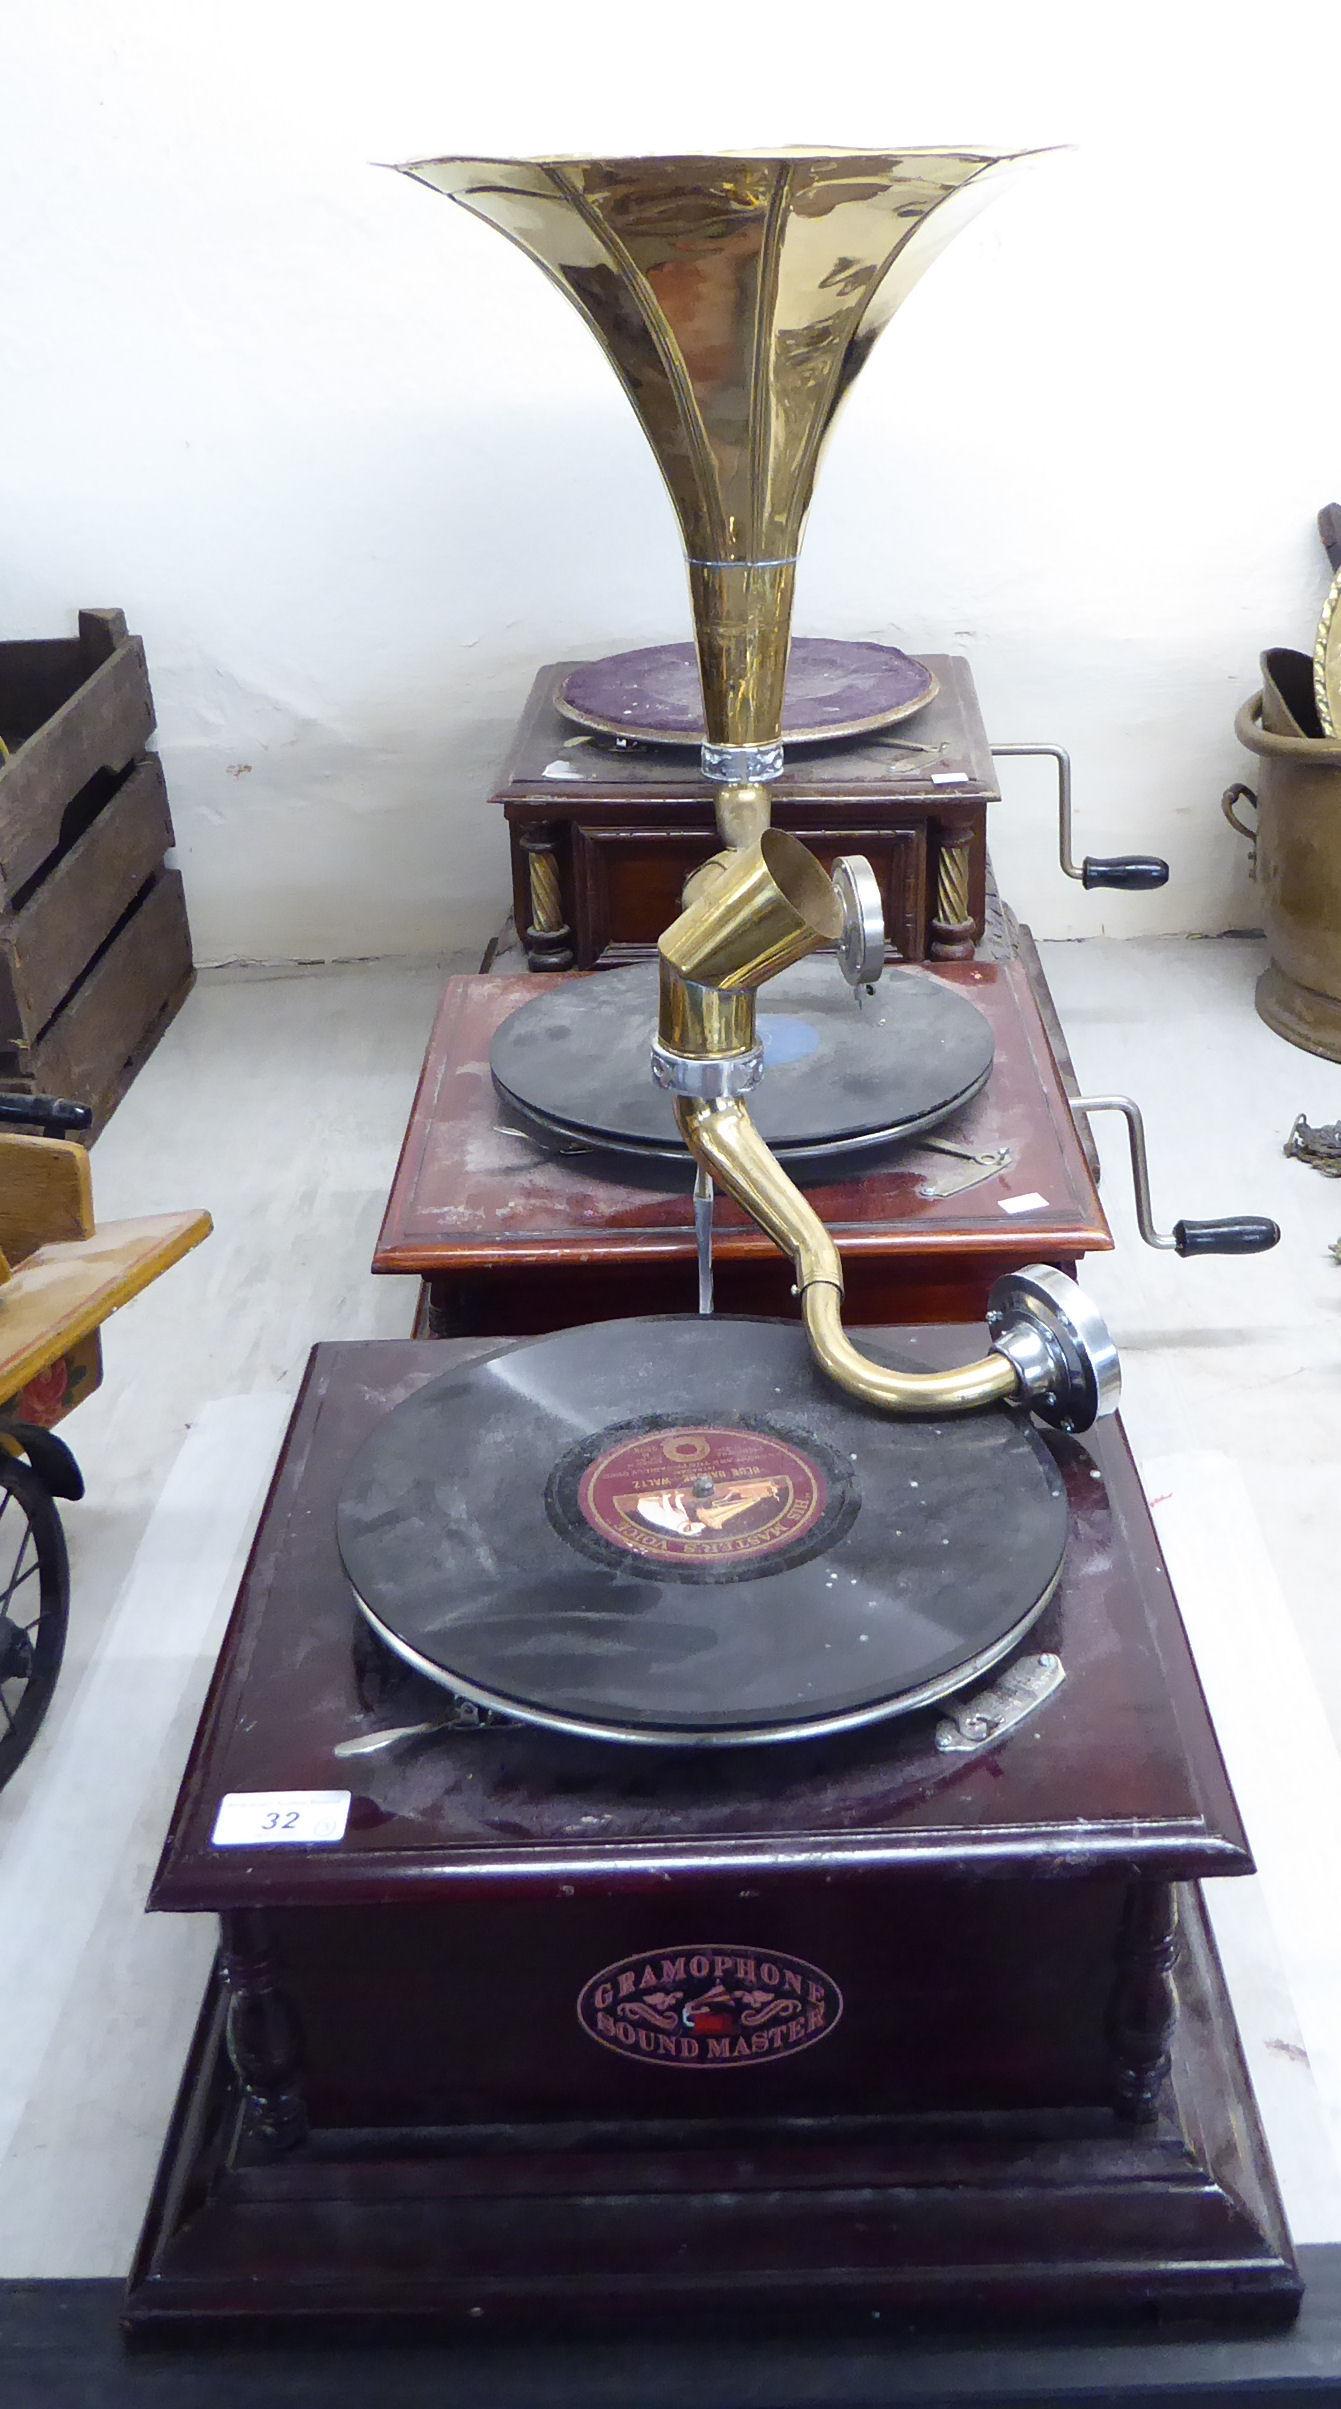 Three similar HMV and Soundmaster gramophones,